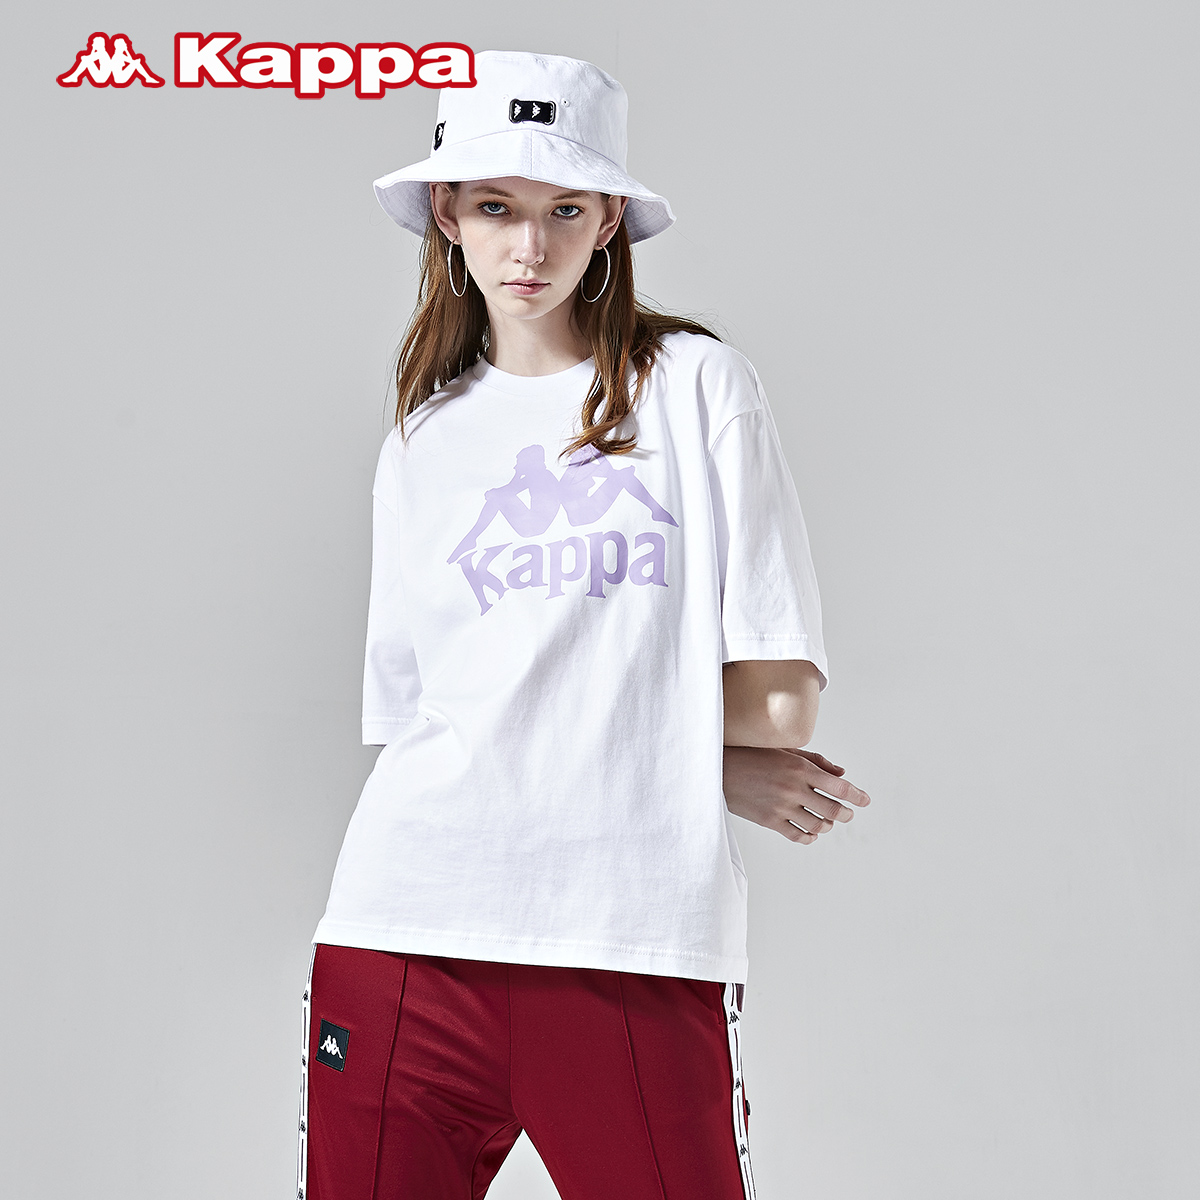 Kappa卡帕女装2019新款短袖T恤圆领图案衫-K0922TD11